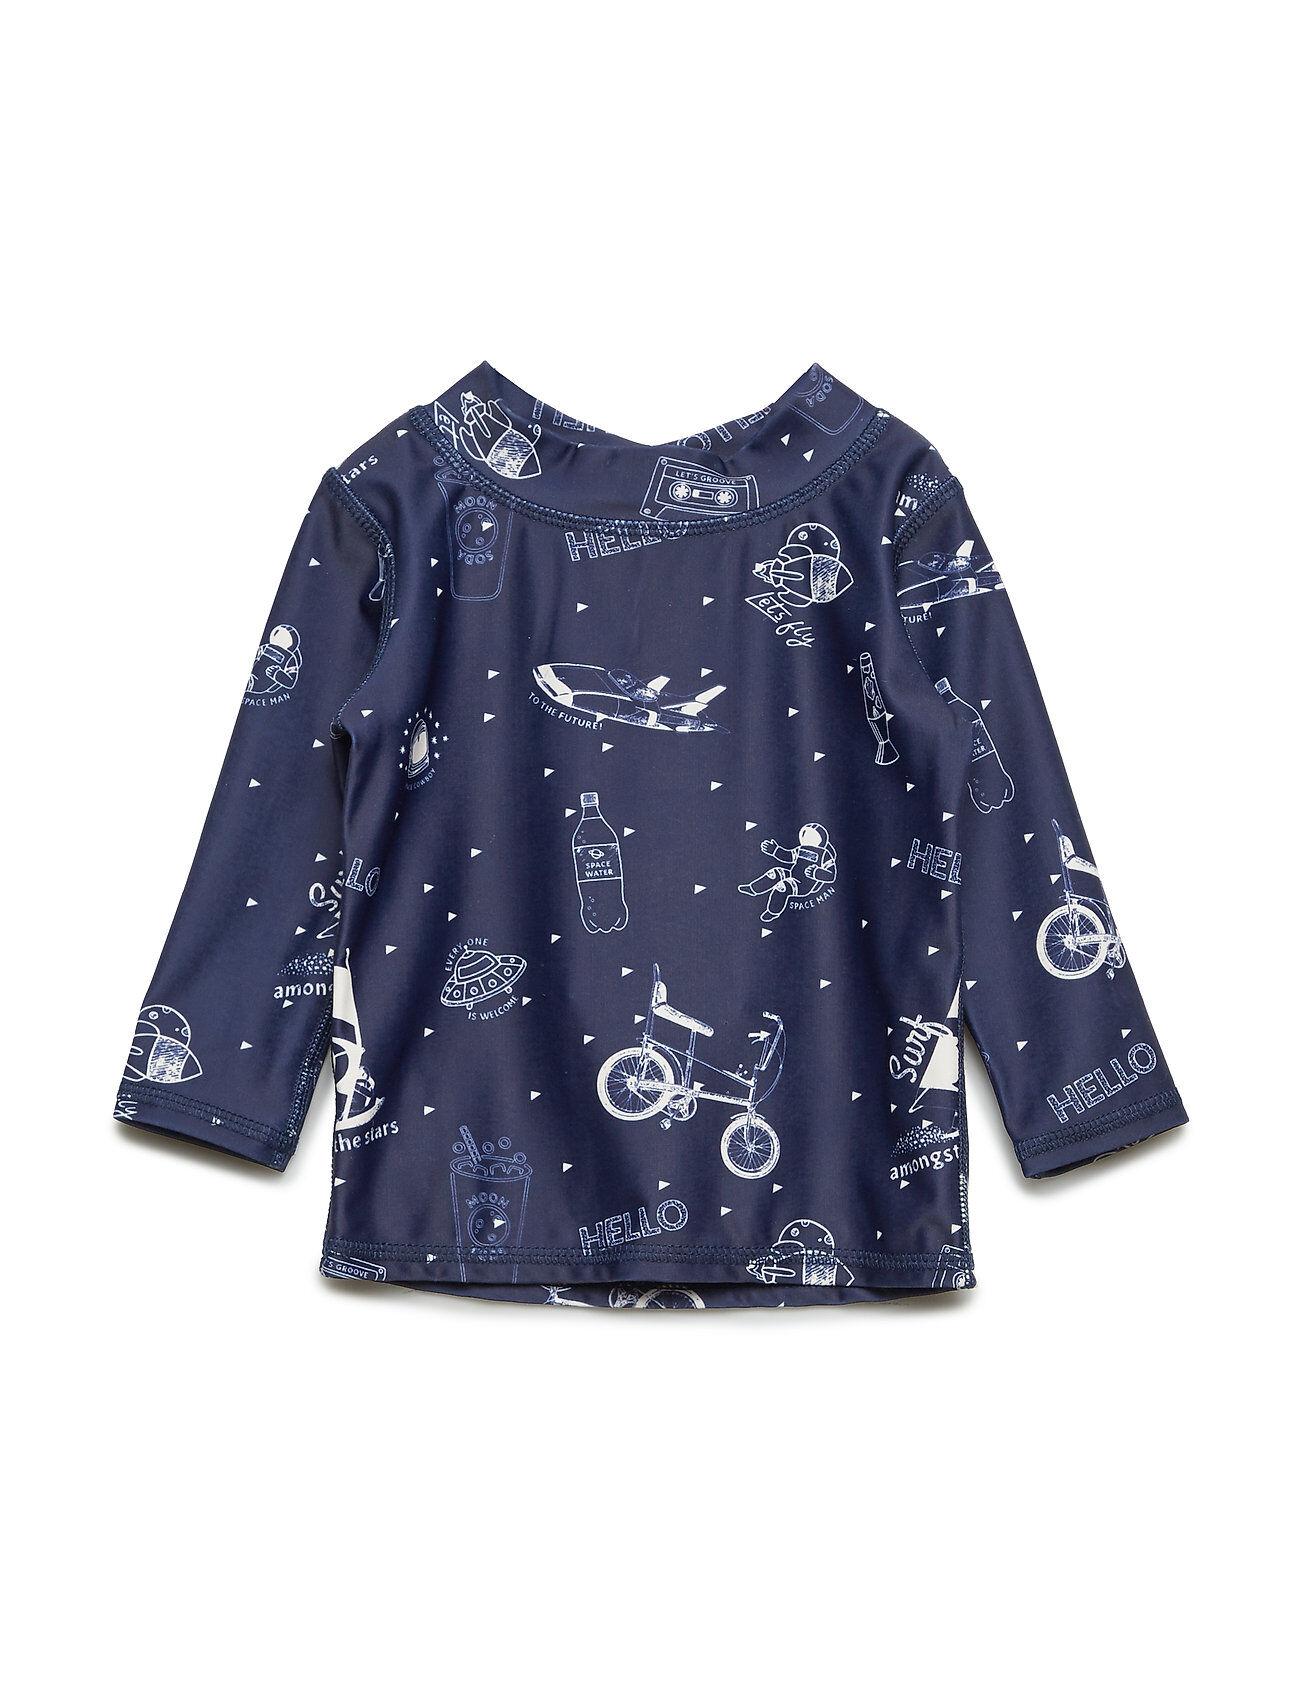 Image of Soft Gallery Baby Astin Sun Shirt Swimwear UV Clothing UV Tops Sininen Soft Gallery